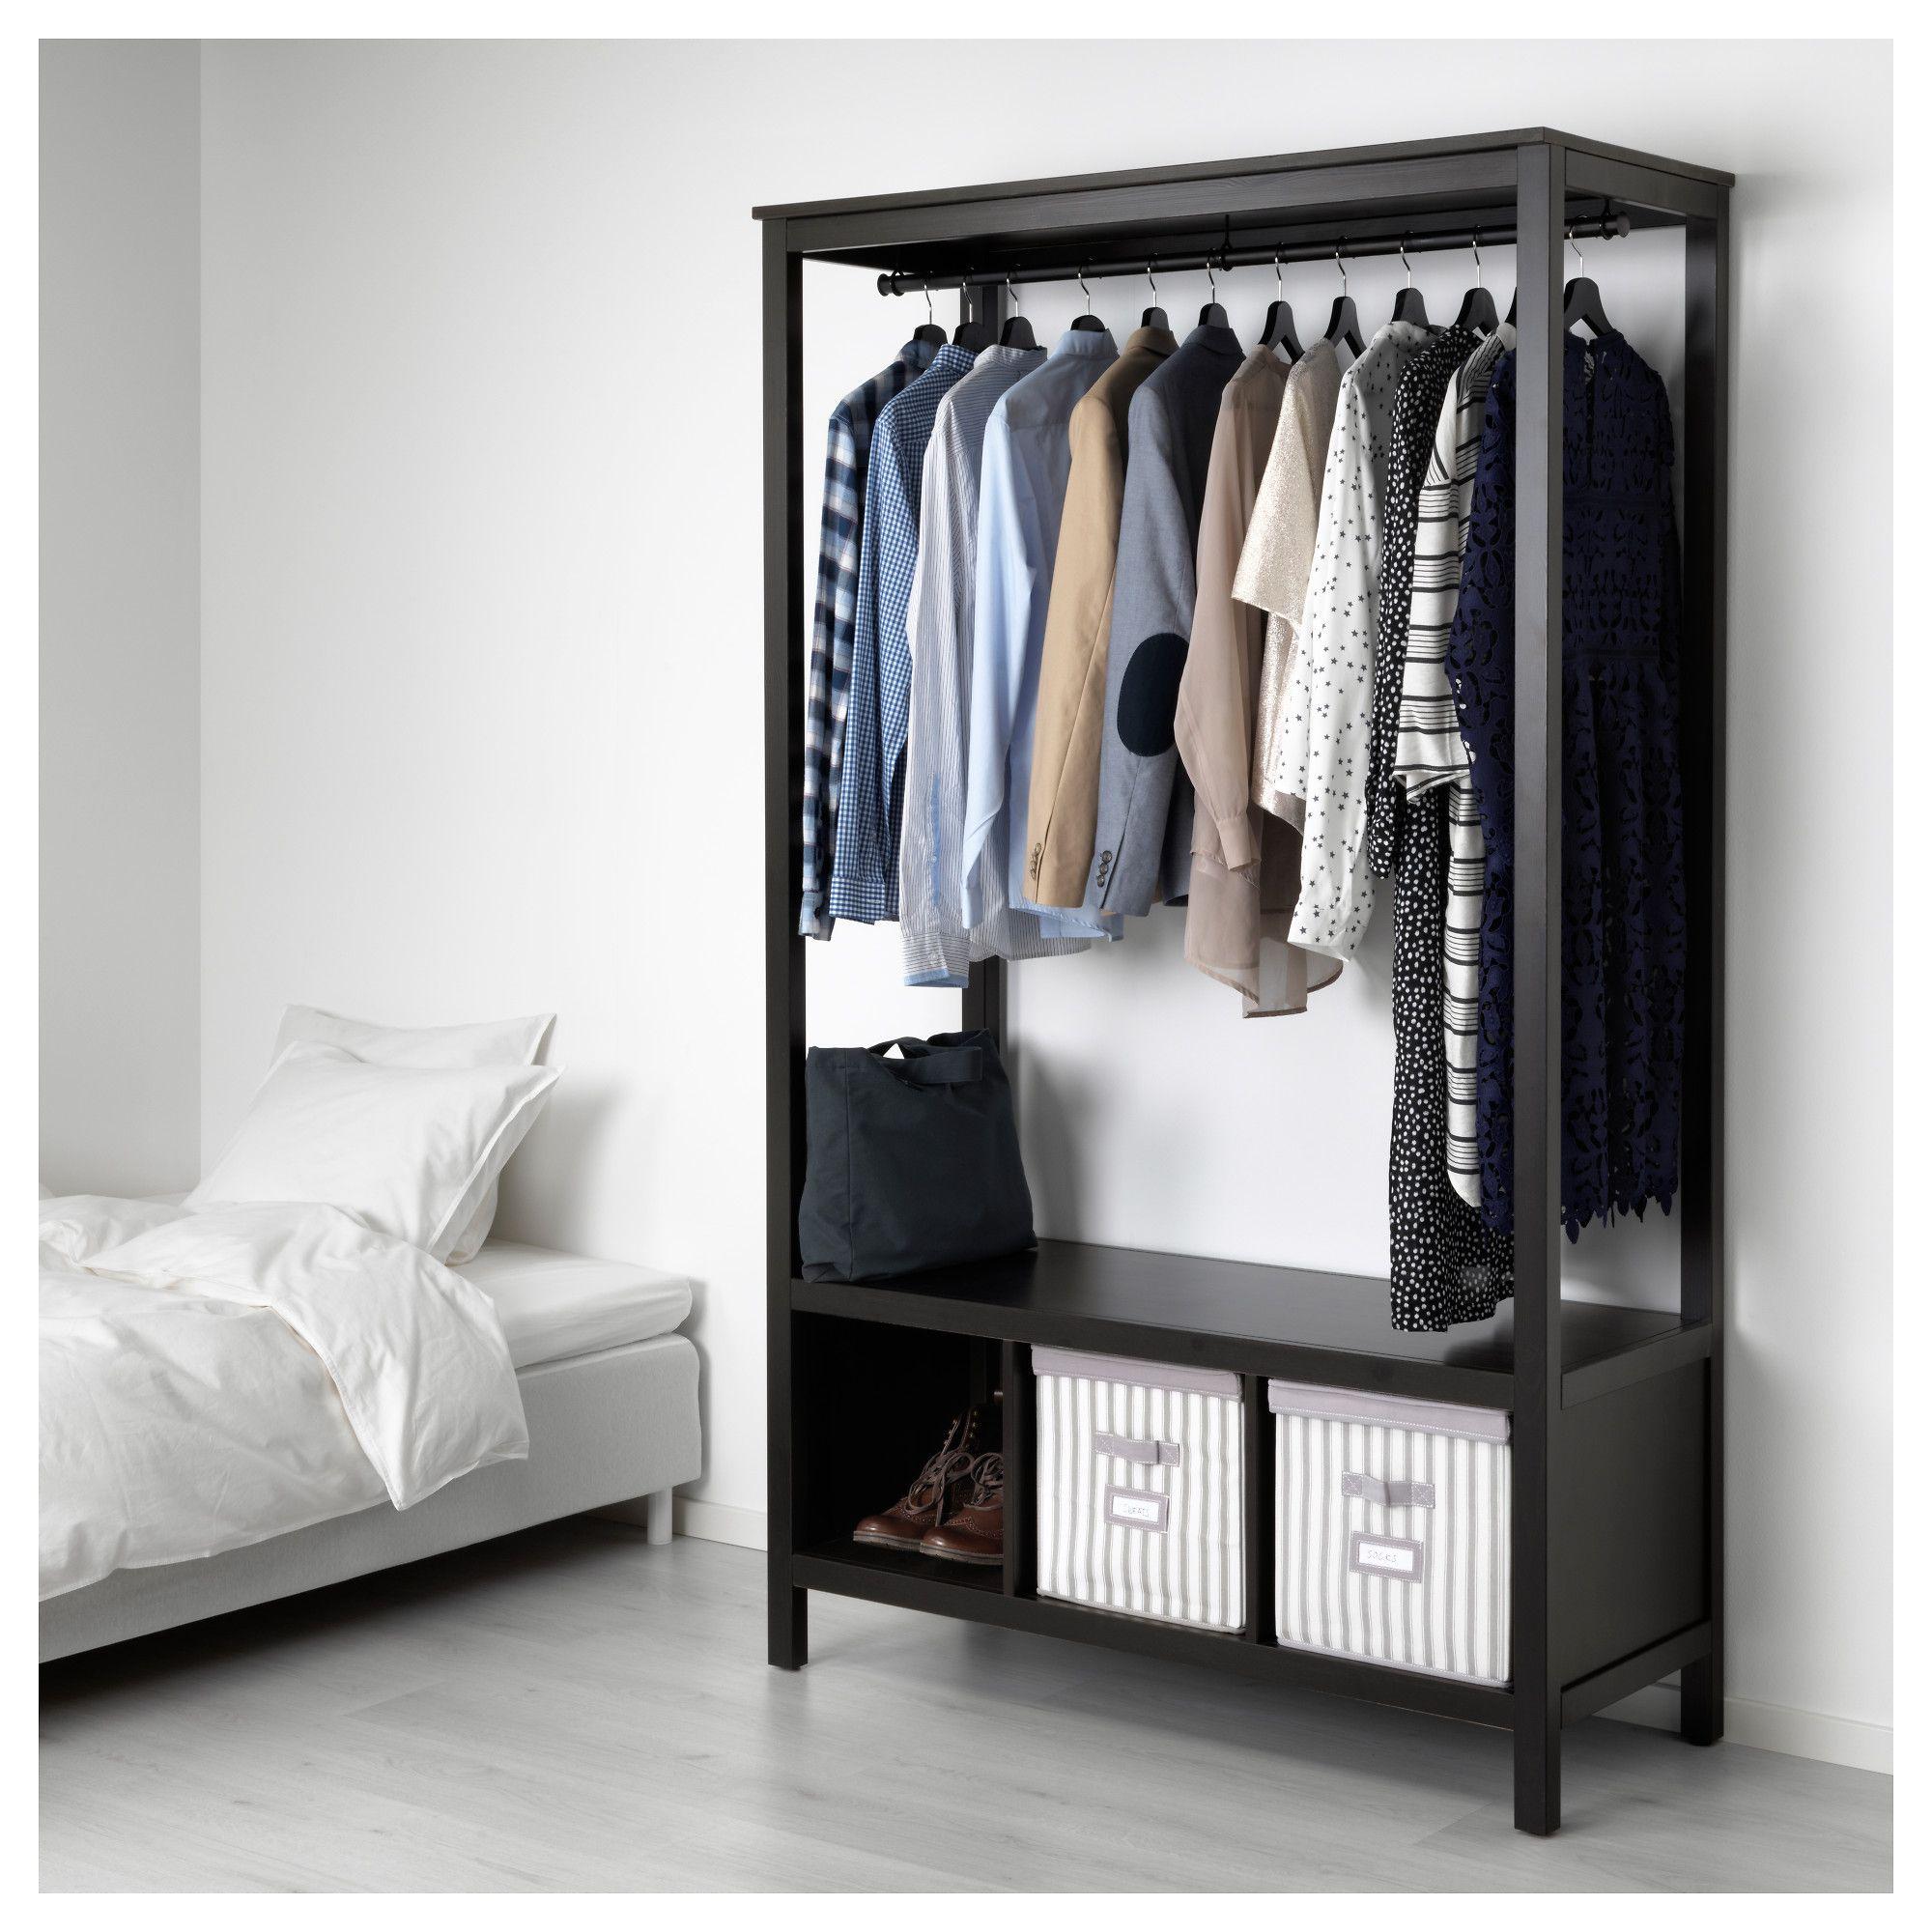 Ikea Hemnes Open Wardrobe Black Brown In 2019 Products